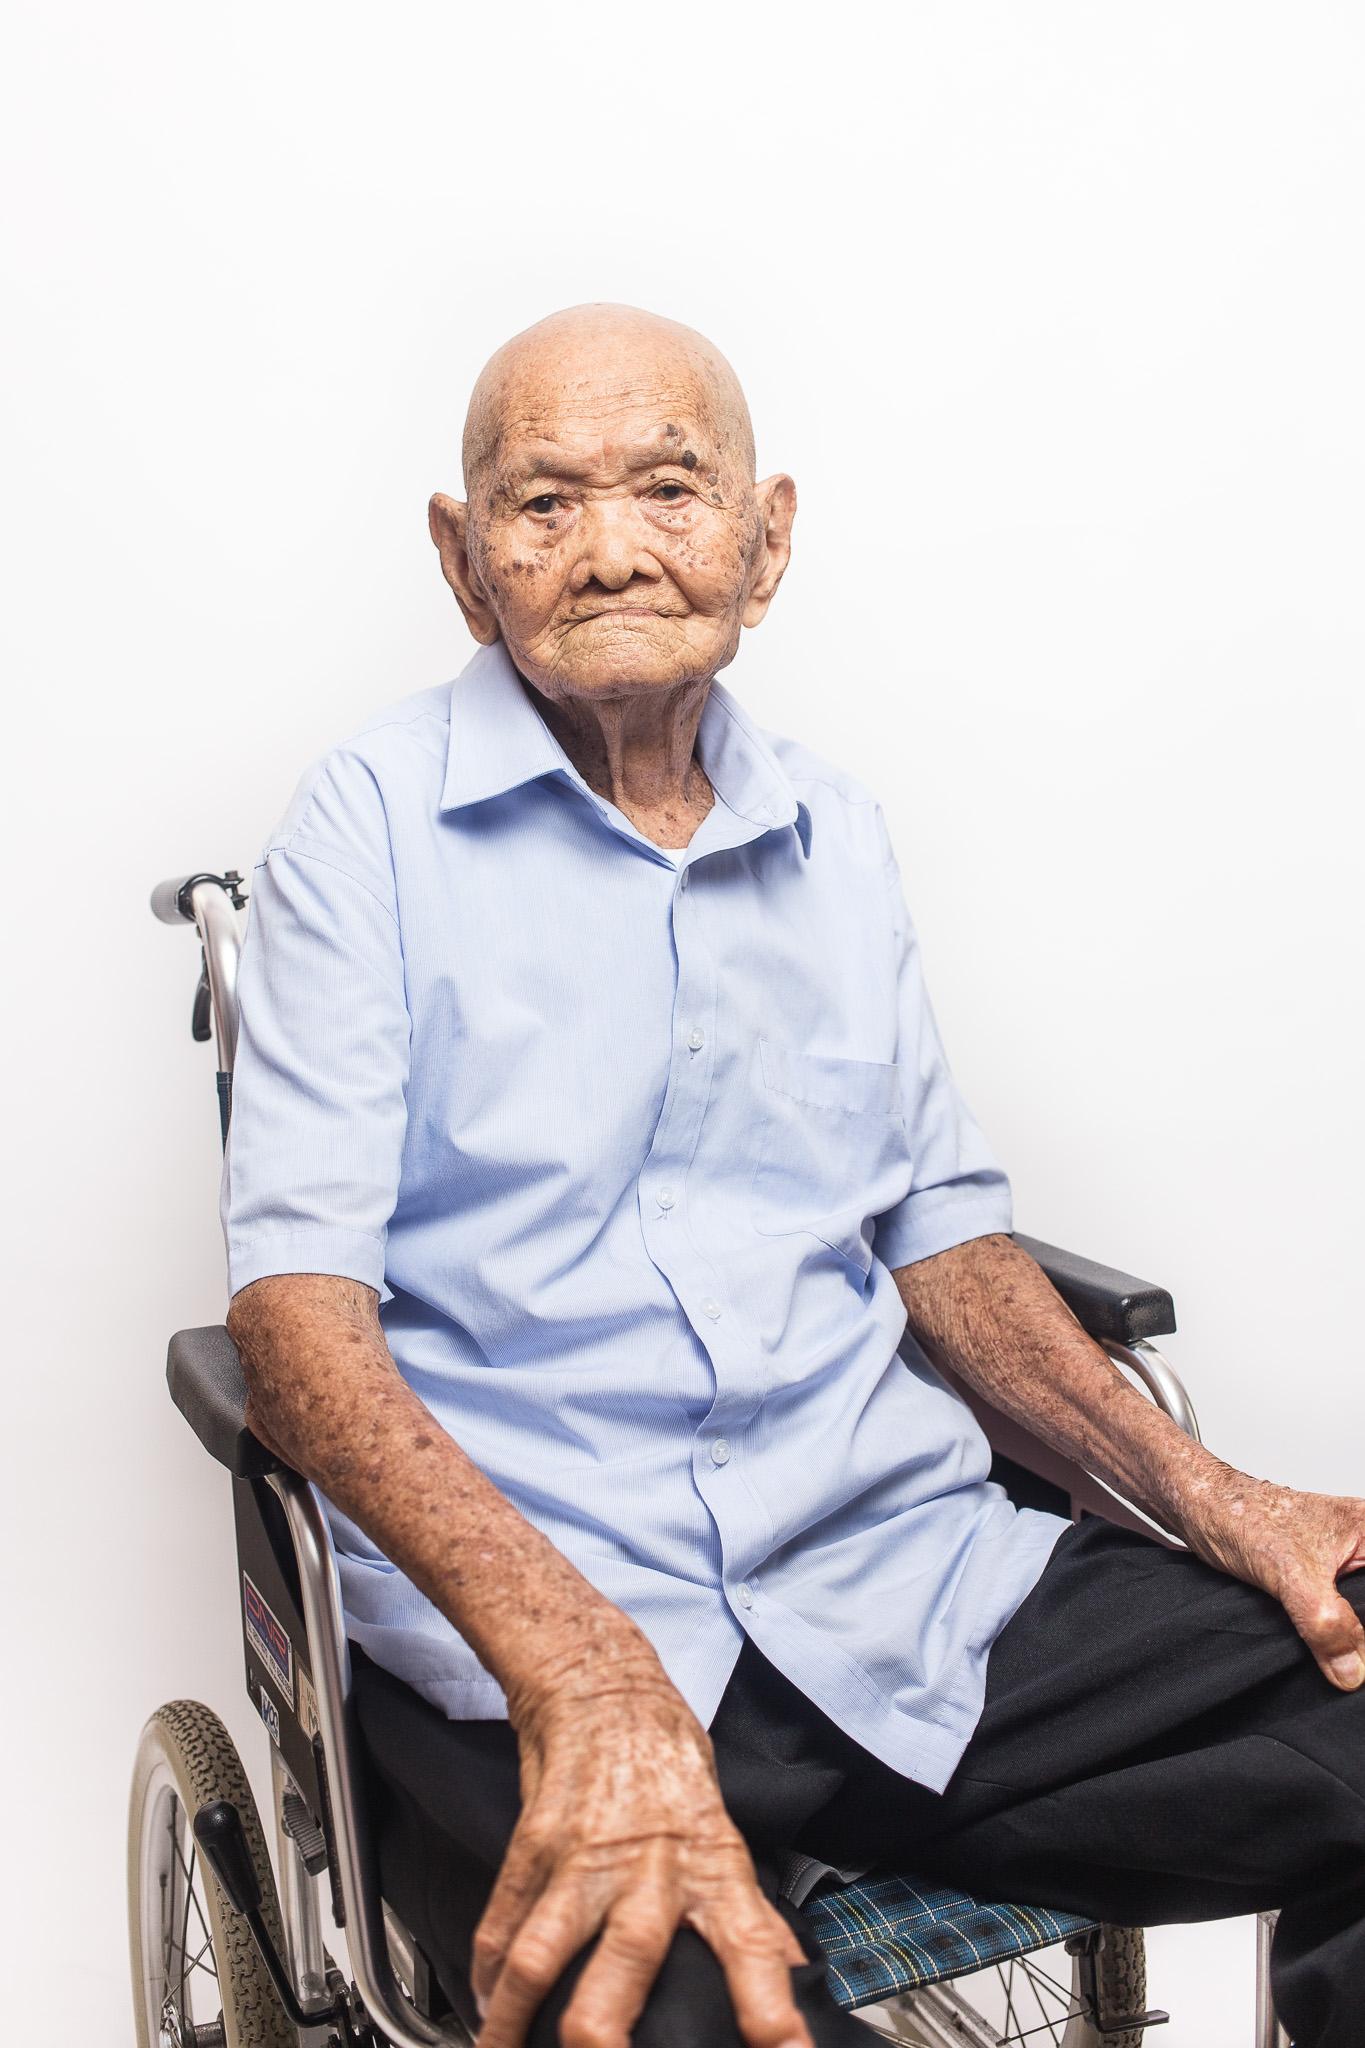 zainal-zainal-studio-centenarians-care-duke-nus-singapore-photographer-18.jpg